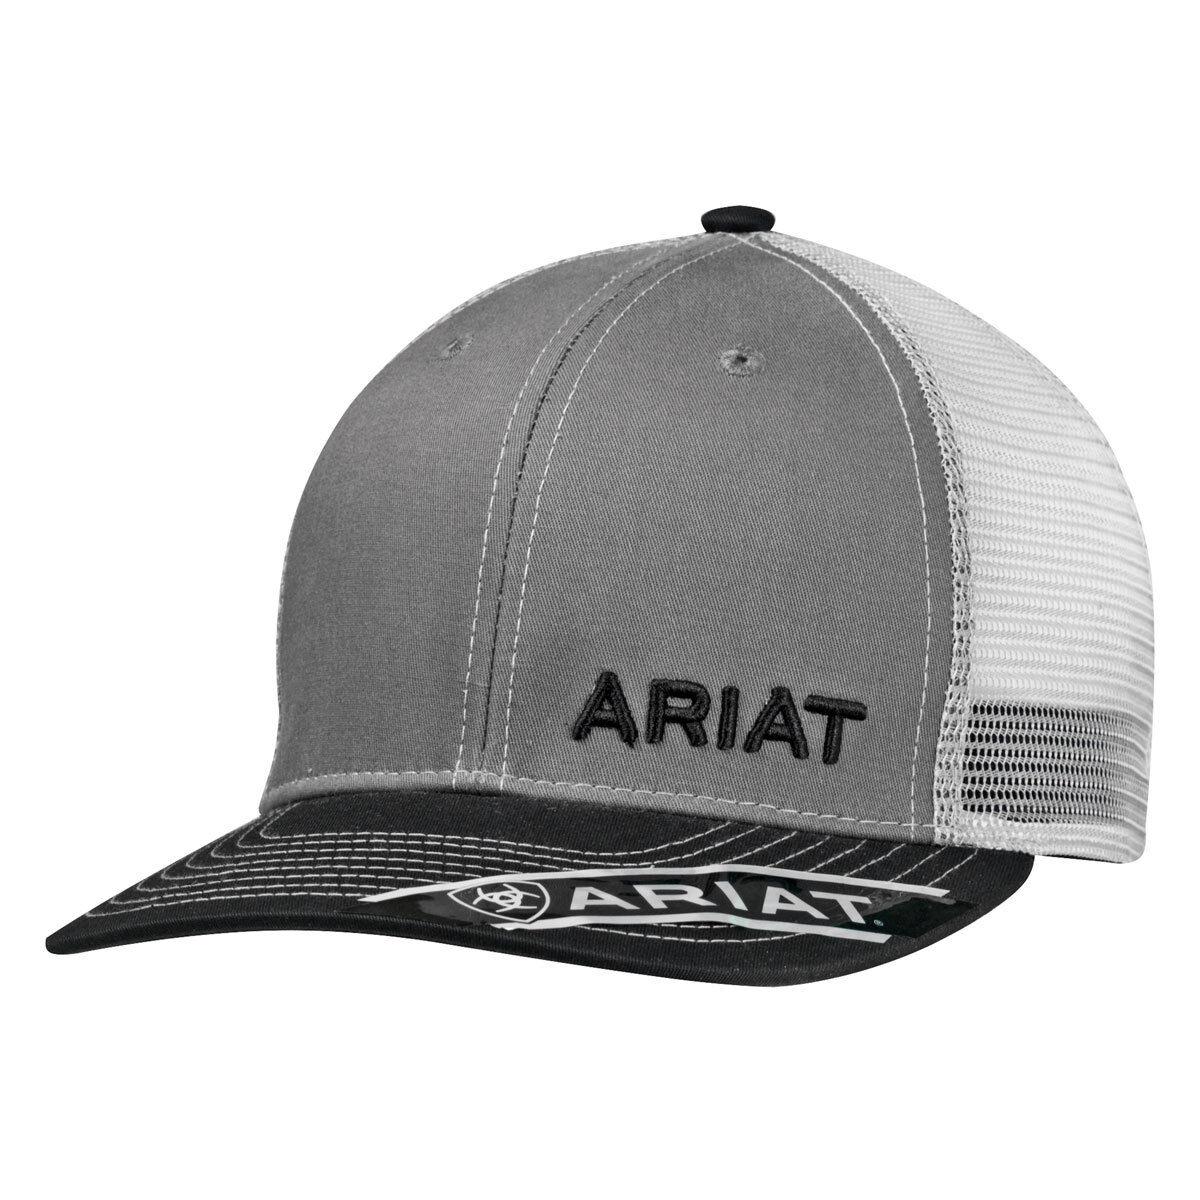 Details about Ariat Mens Hat Baseball Cap Mesh Snapback Grey Black 1501106